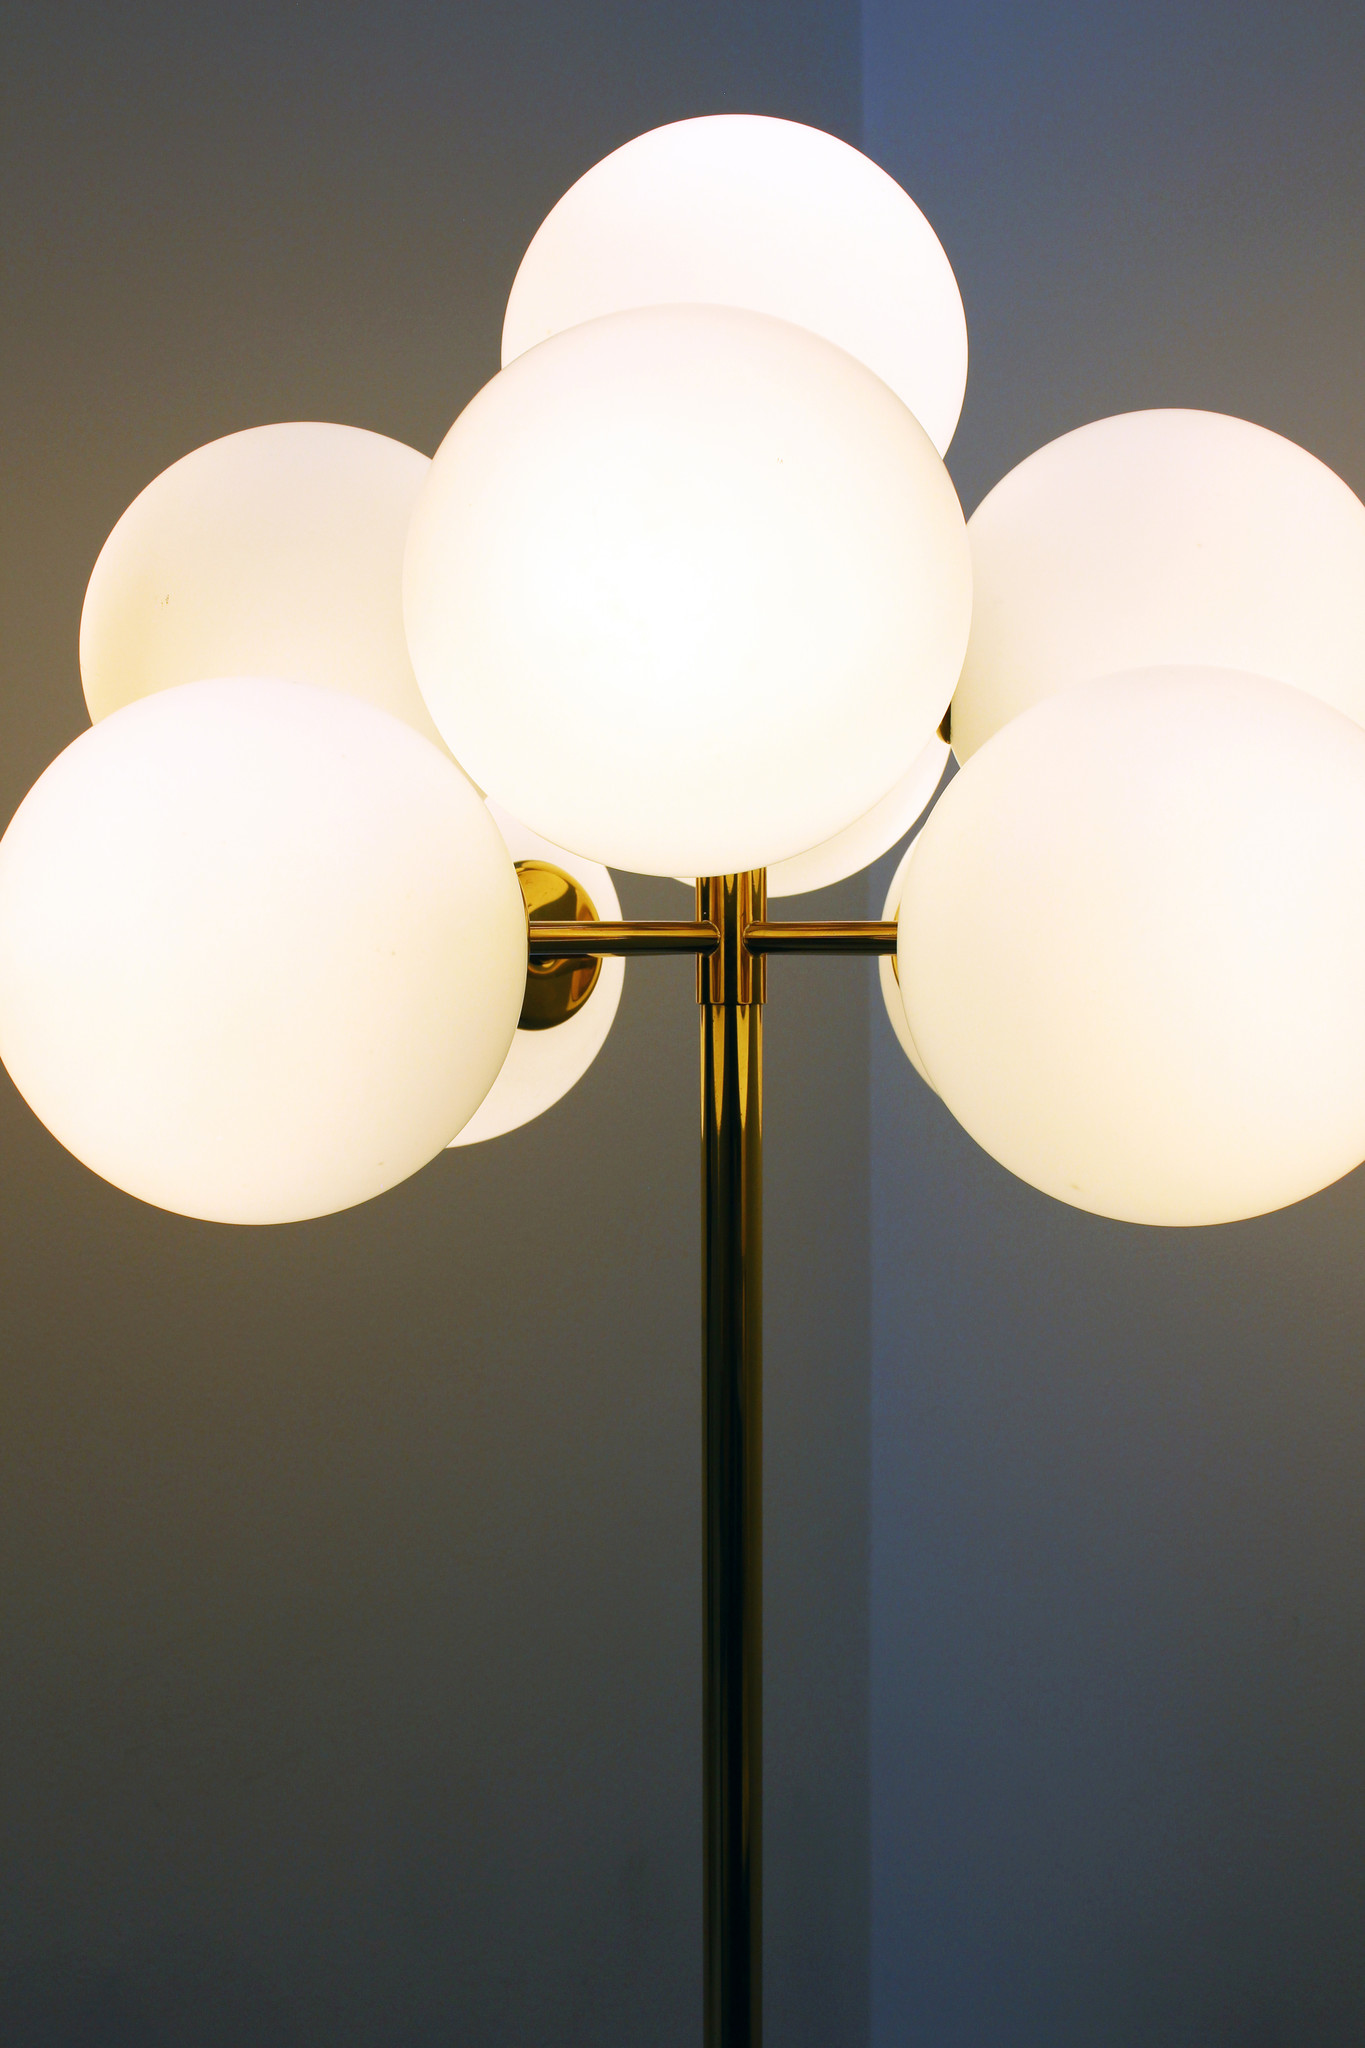 Brass floor lamp by Max Bill For Temde 1960s